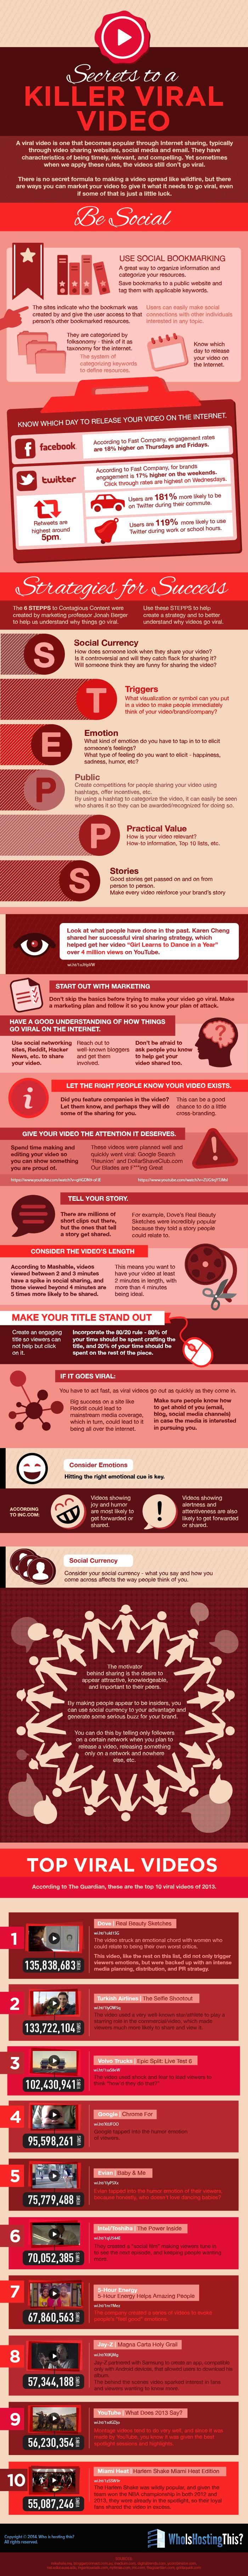 #ContentMarketing: Secrets To A Killer Viral Video - #infographic #socialmedia